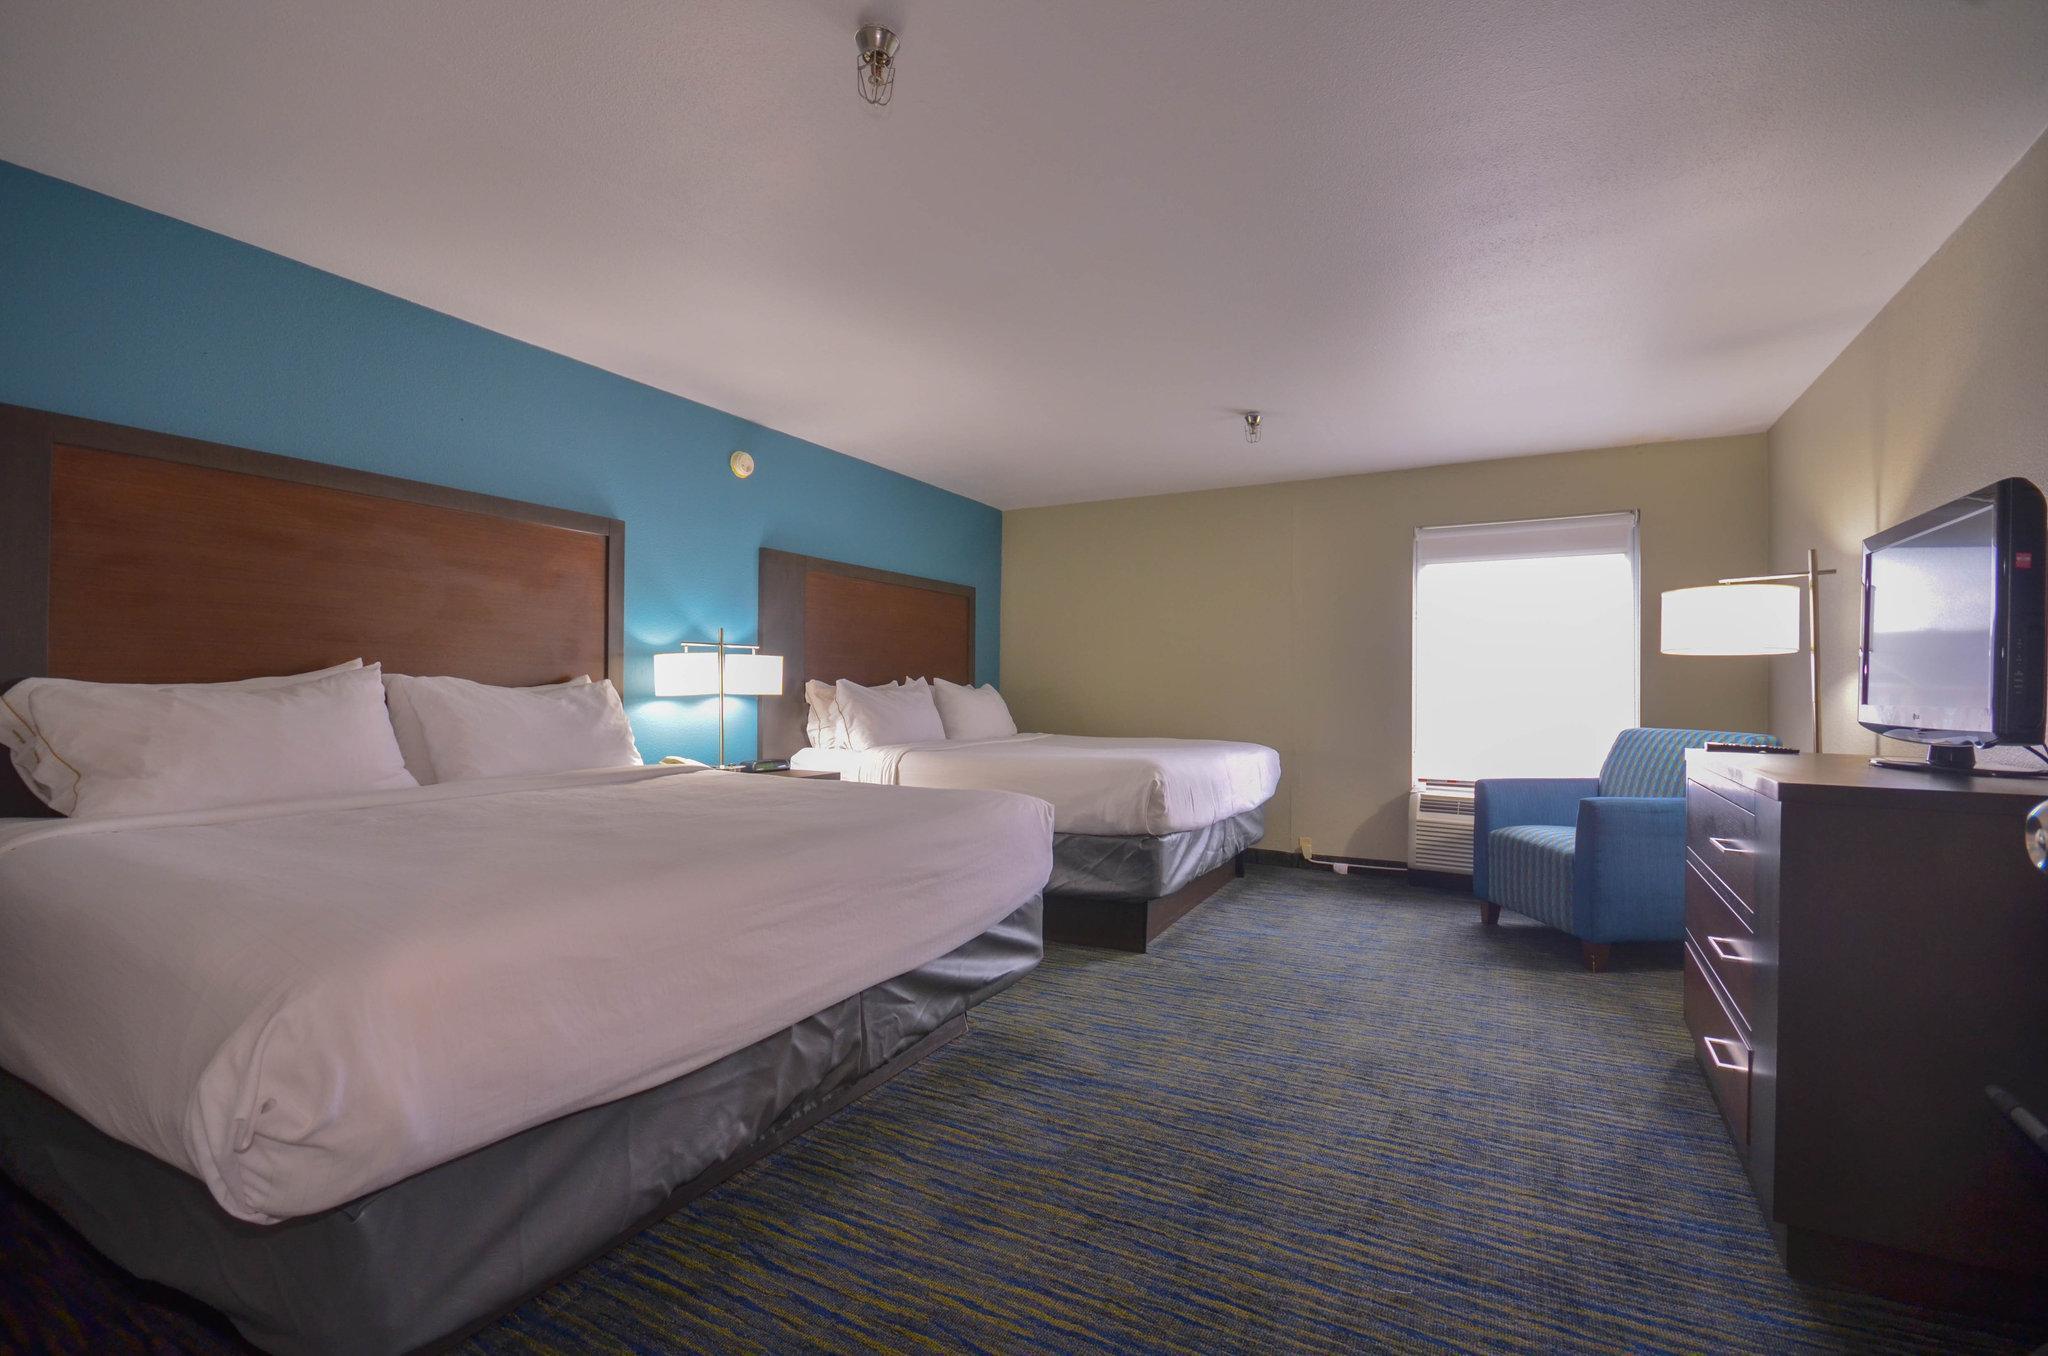 Holiday Inn Express & Suites Fayetteville University Of Arkansas Area